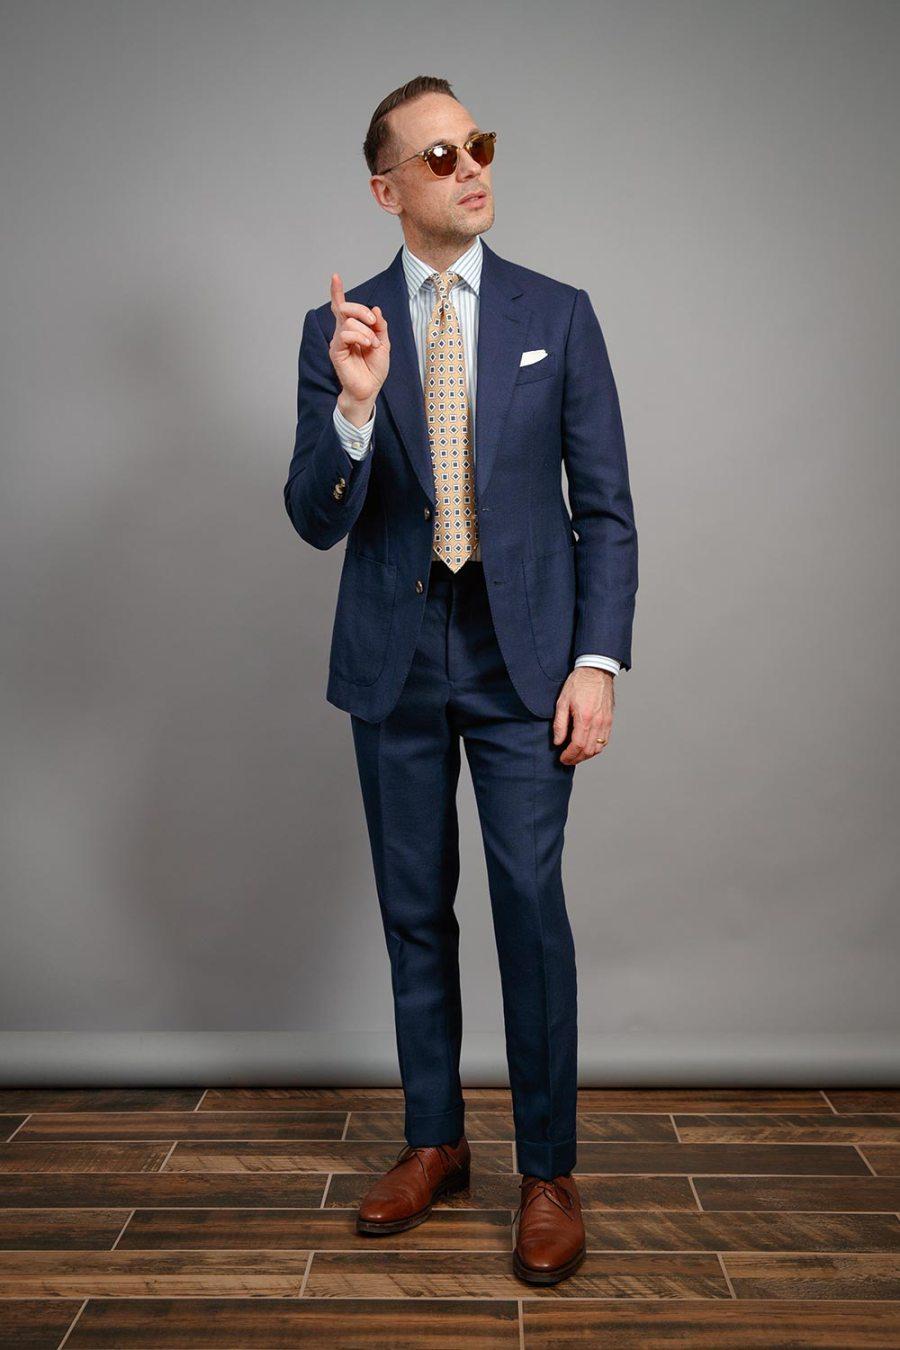 mens-essential-striped-dress-shirt-hopsack-suit-brown-derby-shoes-oliver-peoples-banks-sunglasses